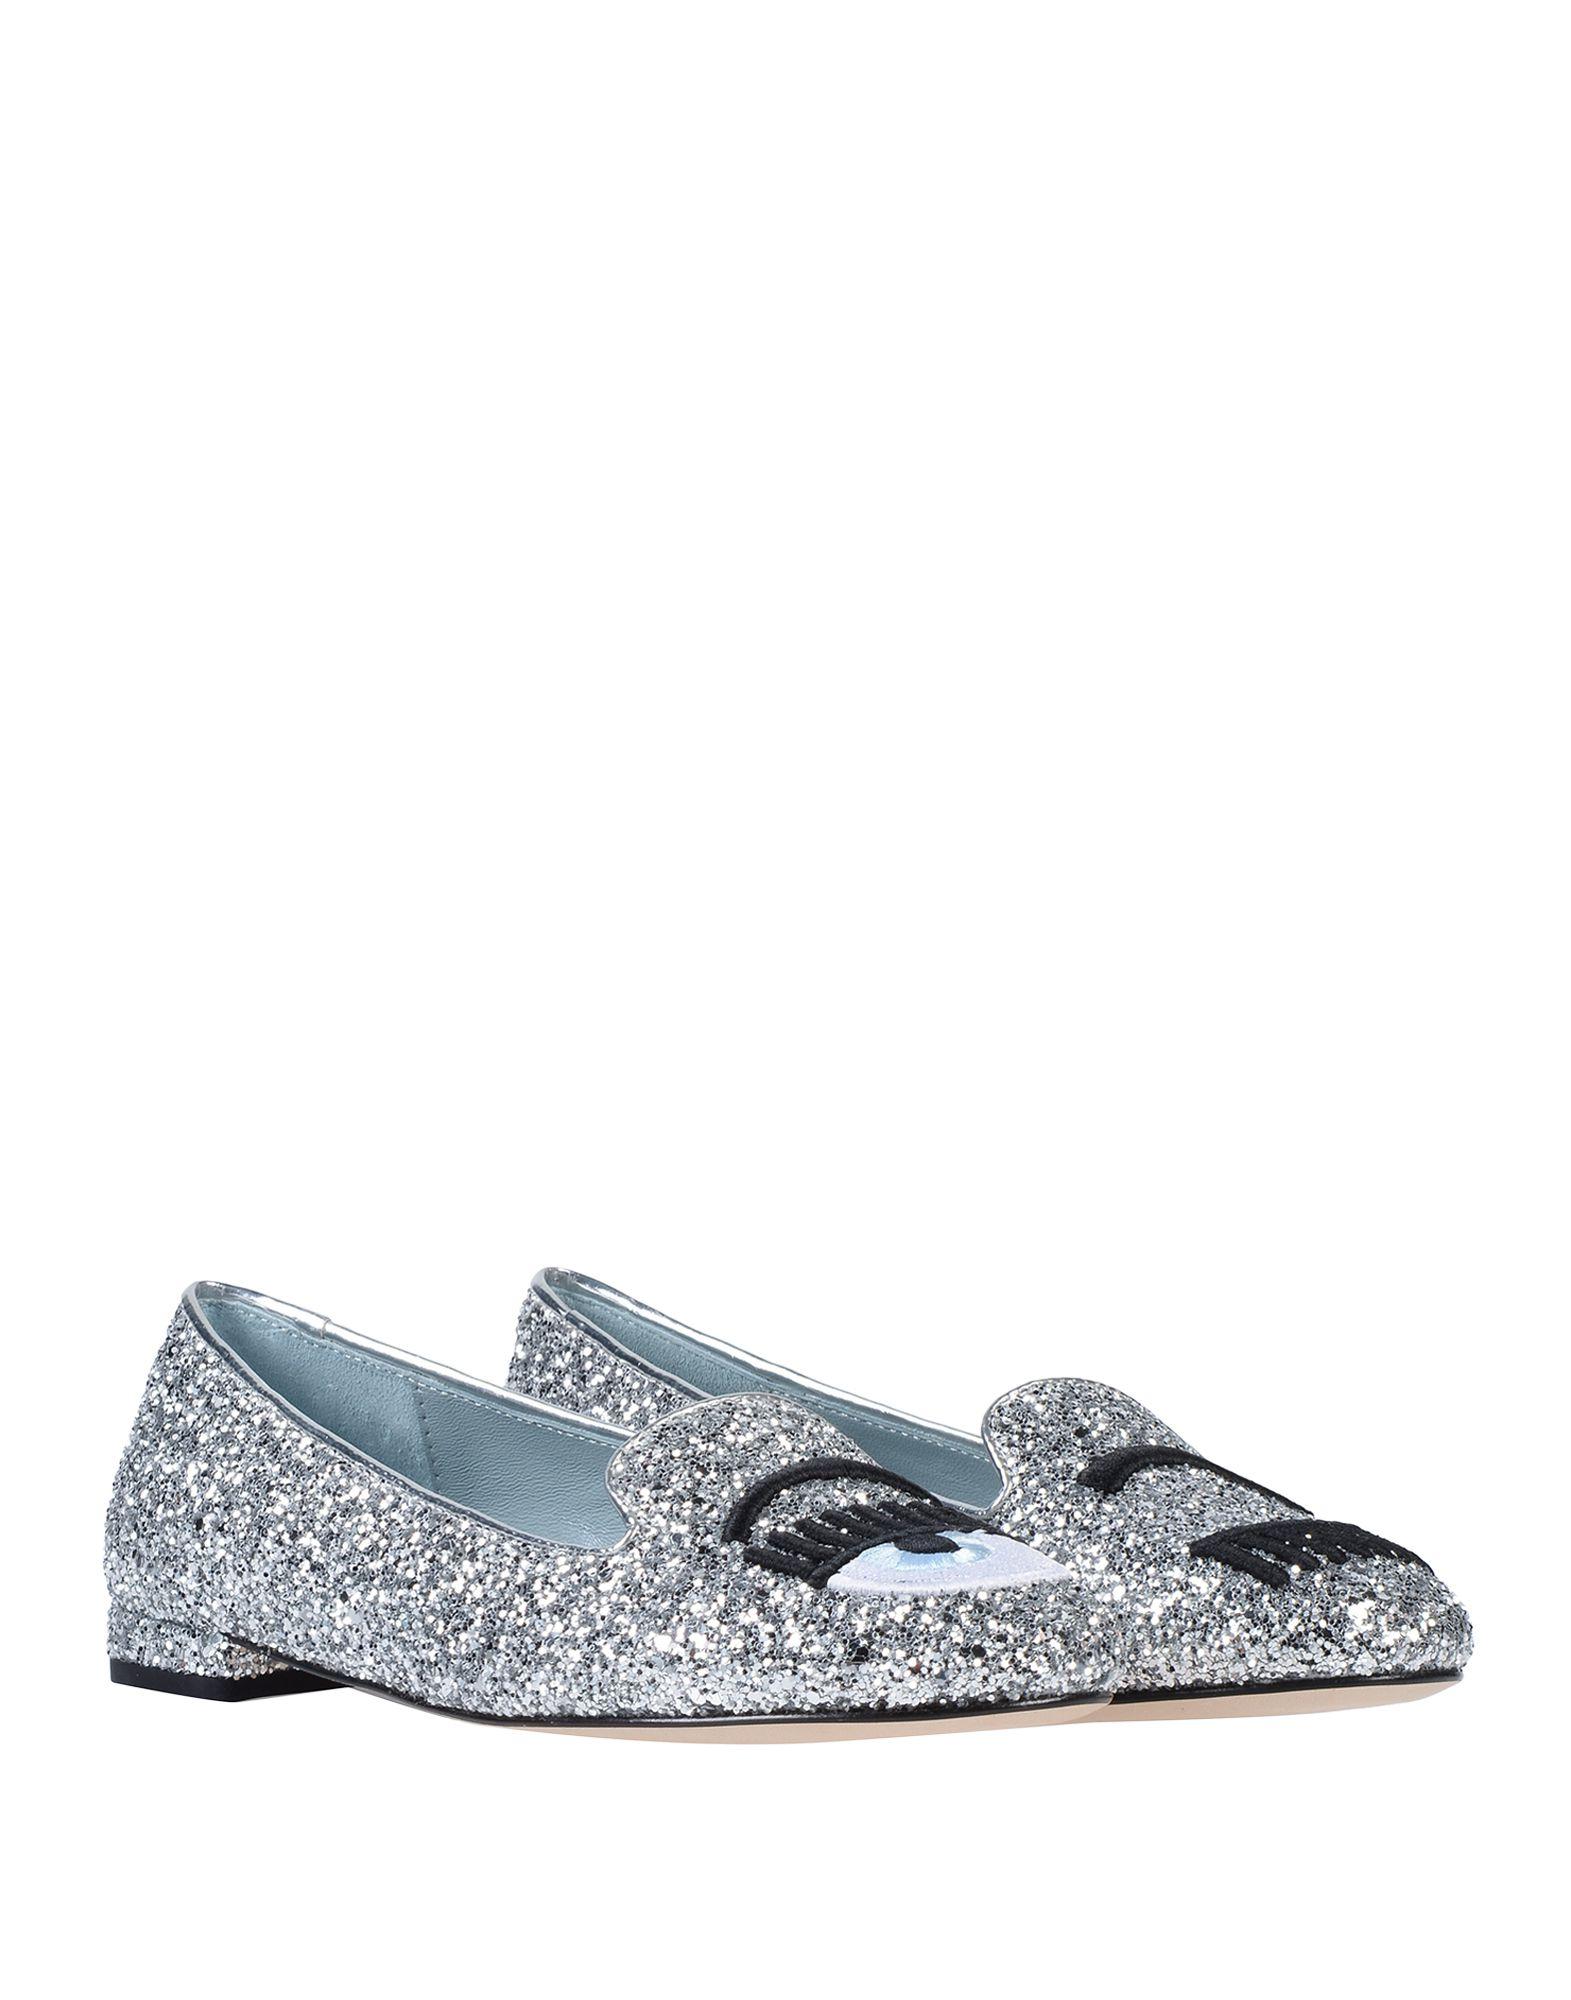 Stilvolle billige Schuhe Chiara  Ferragni Mokassins Damen  Chiara 11227993KC a426d6